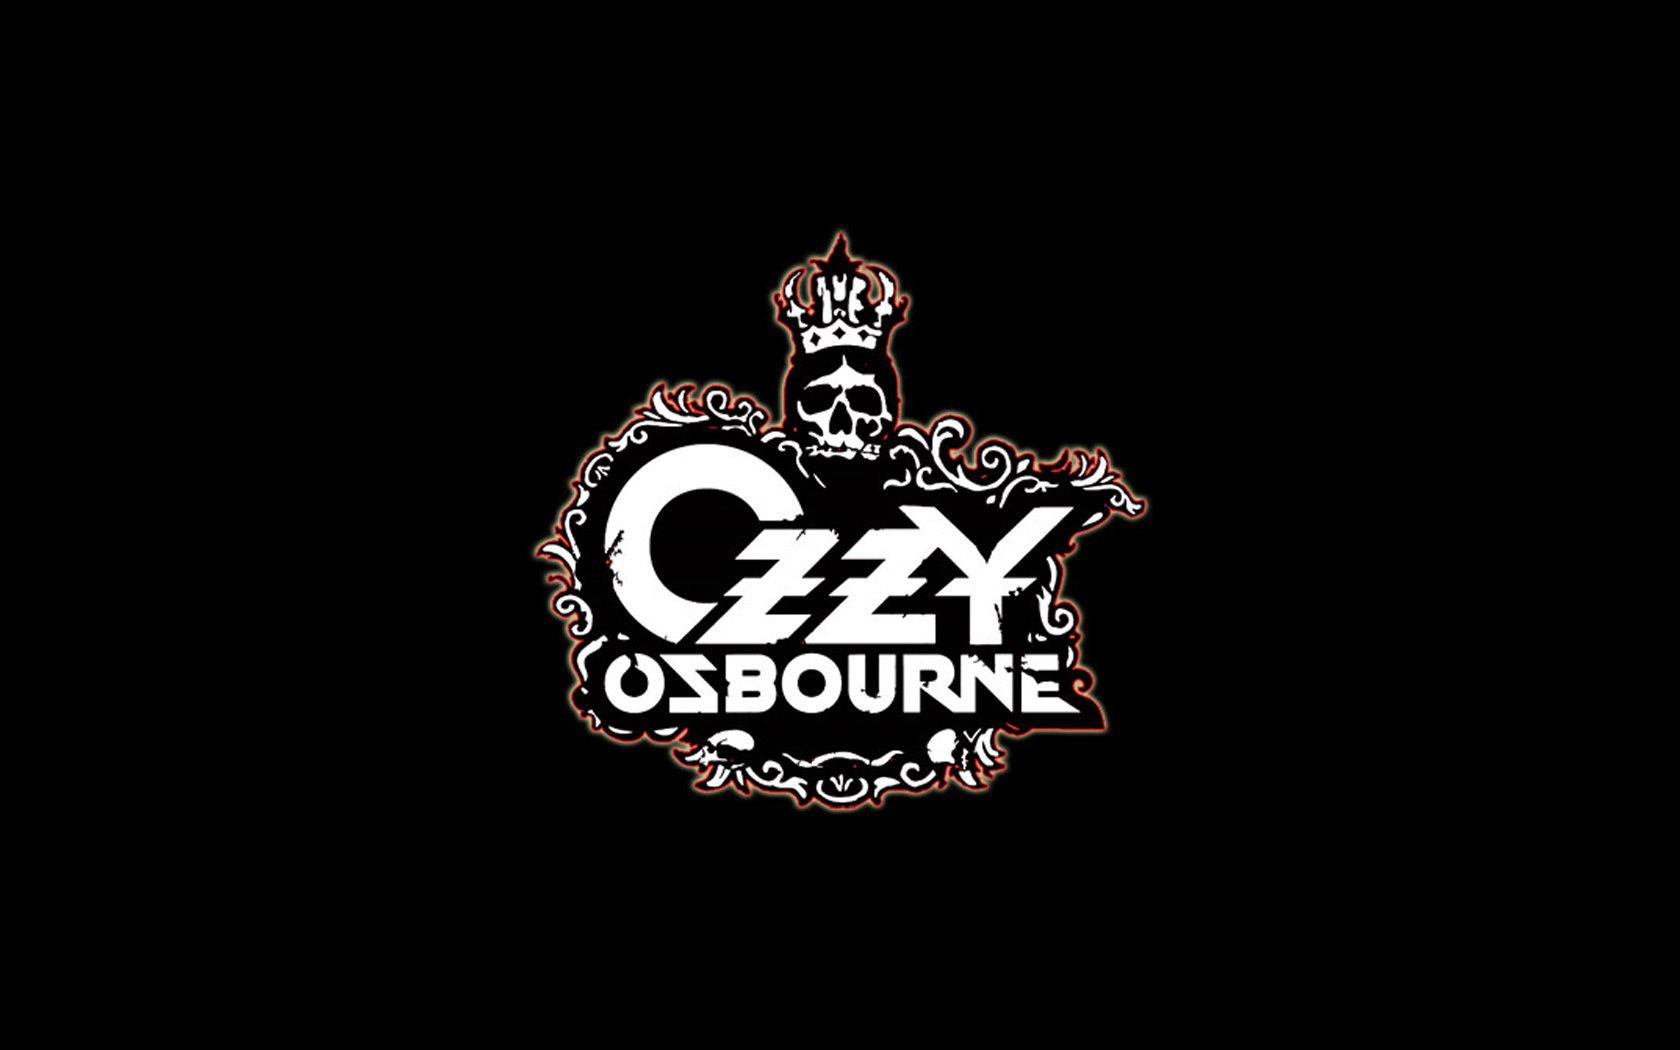 Ozzy Osbourne Wallpapers Hd For Desktop Backgrounds